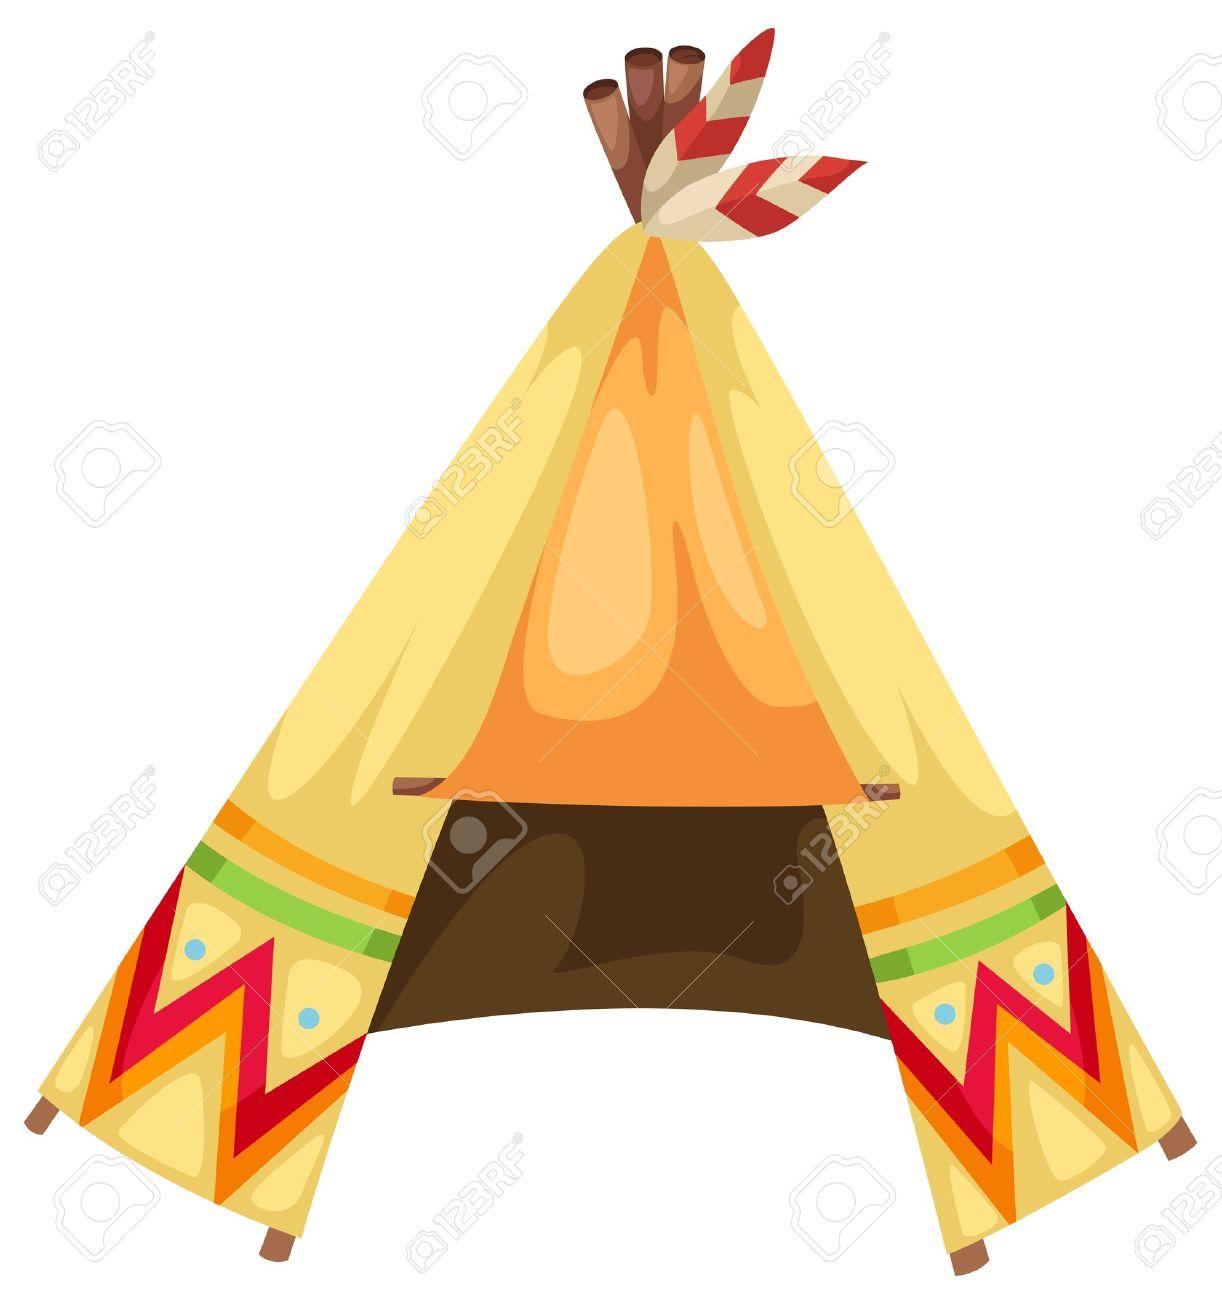 cartoon indians tepee vector Stock Vector - 16887126  sc 1 st  123RF.com & Cartoon Indians Tepee Vector Royalty Free Cliparts Vectors And ...